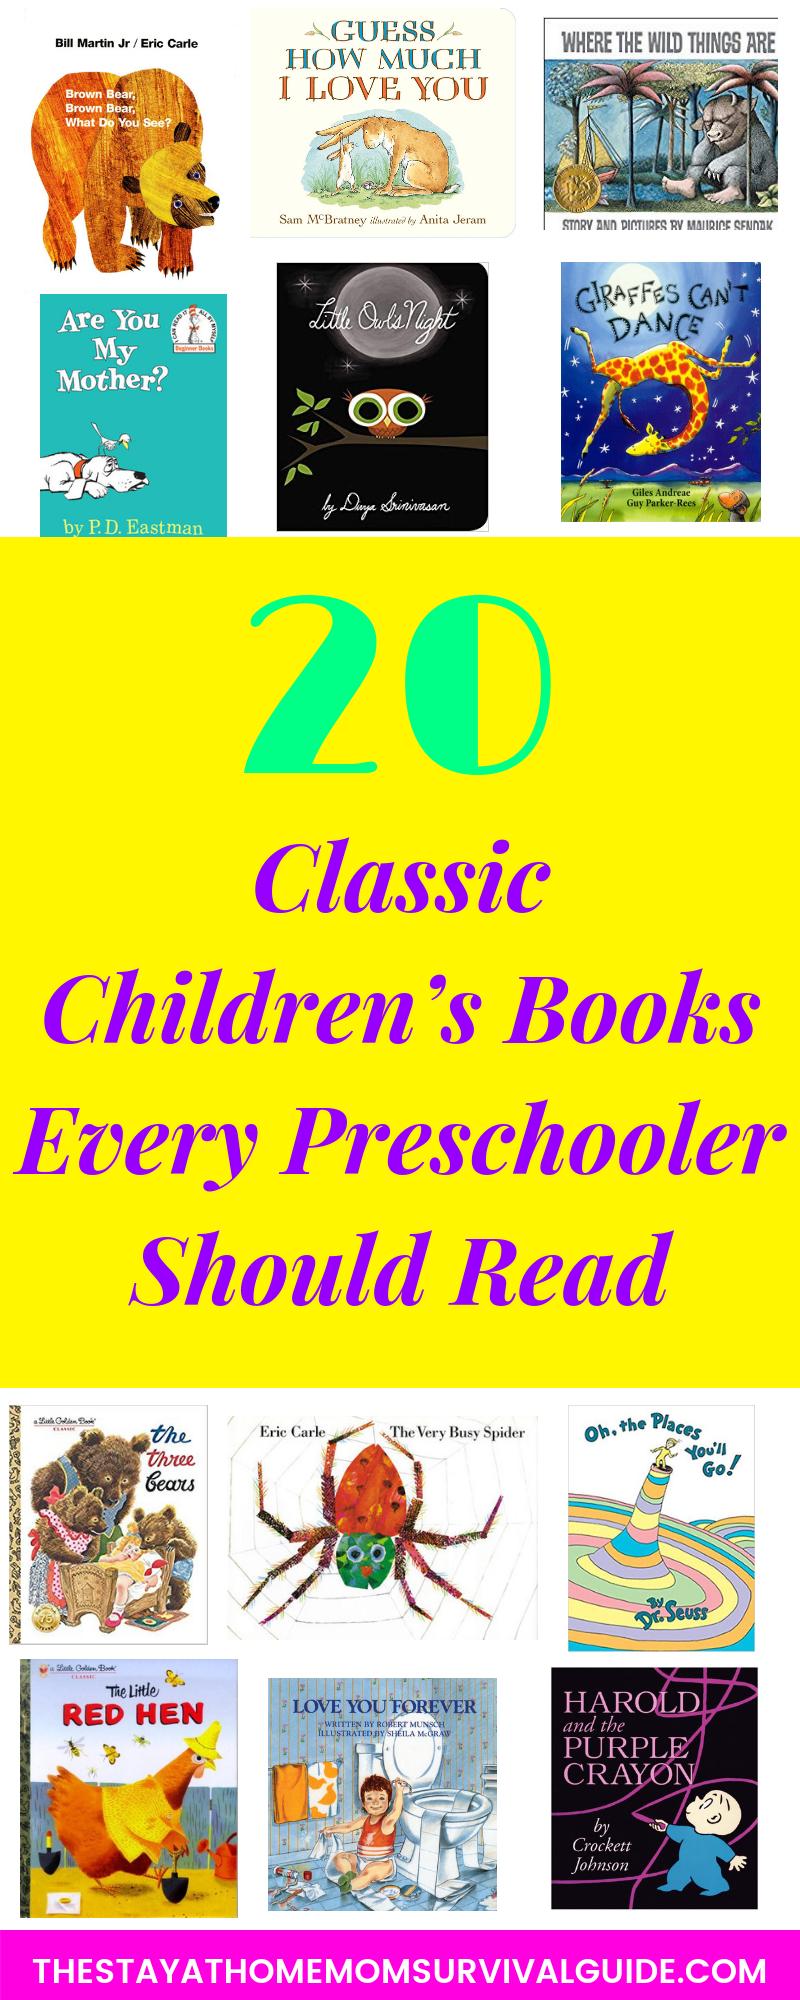 20 Classic Children's Books Every Preschooler Should Read